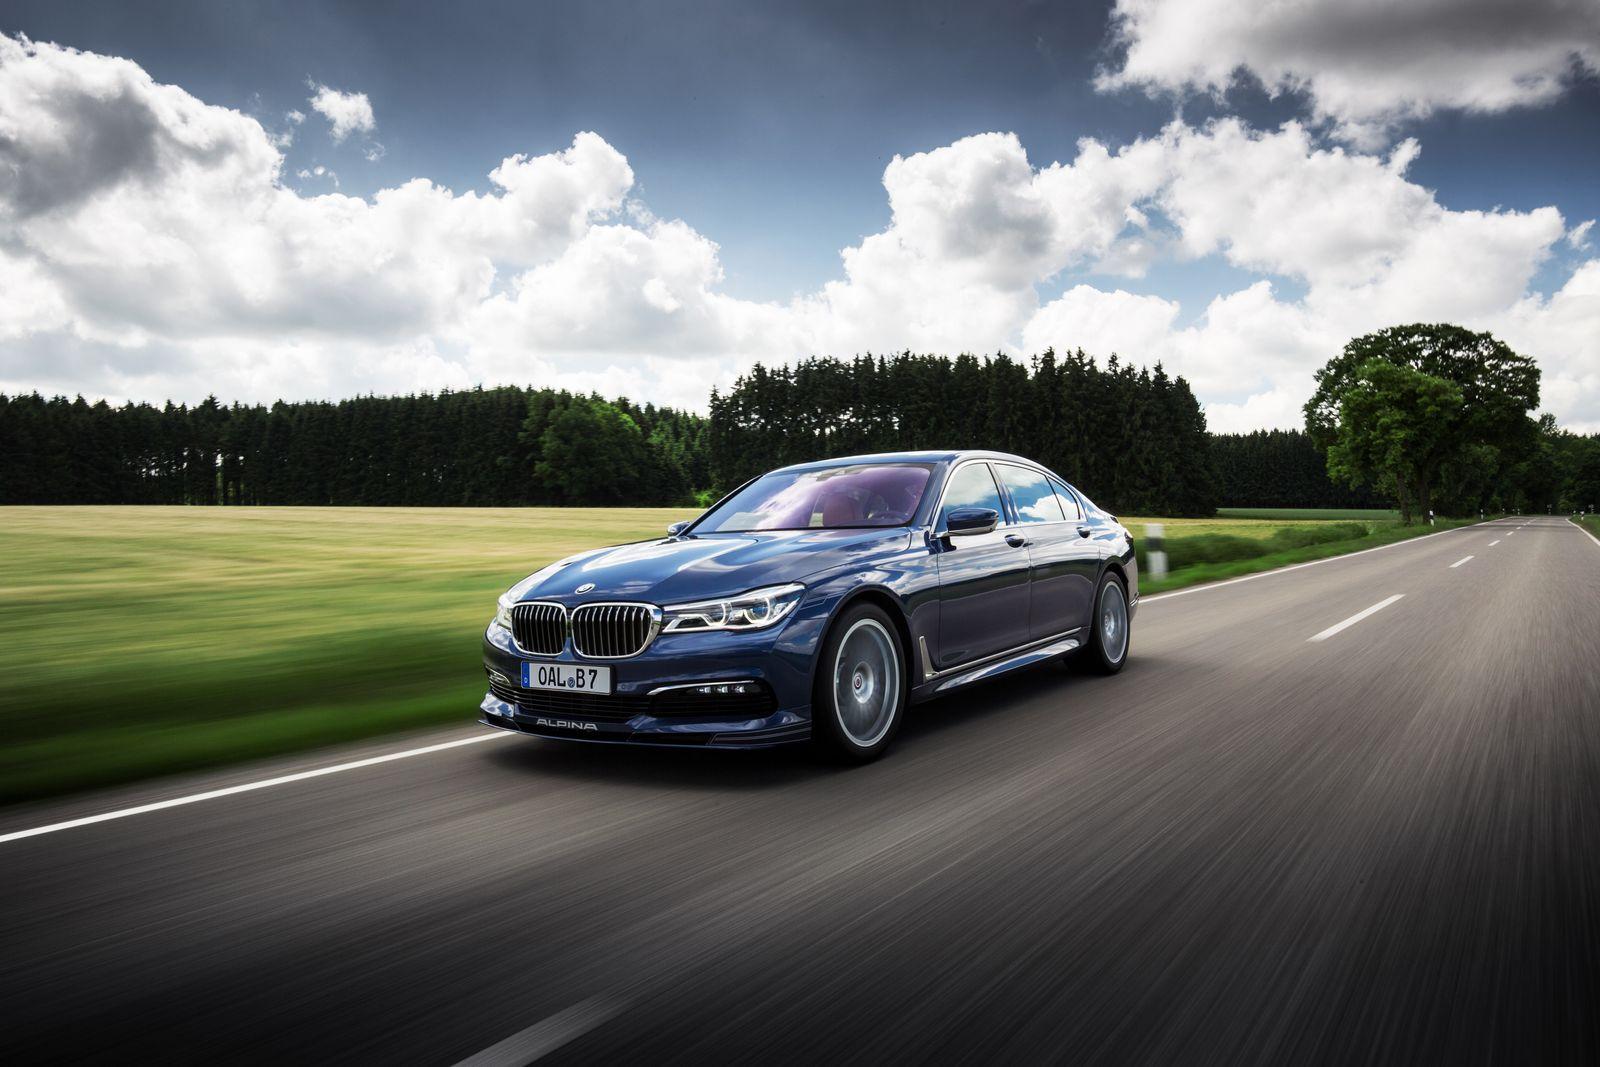 2016 / BMW ALPINA B7 BITURBO